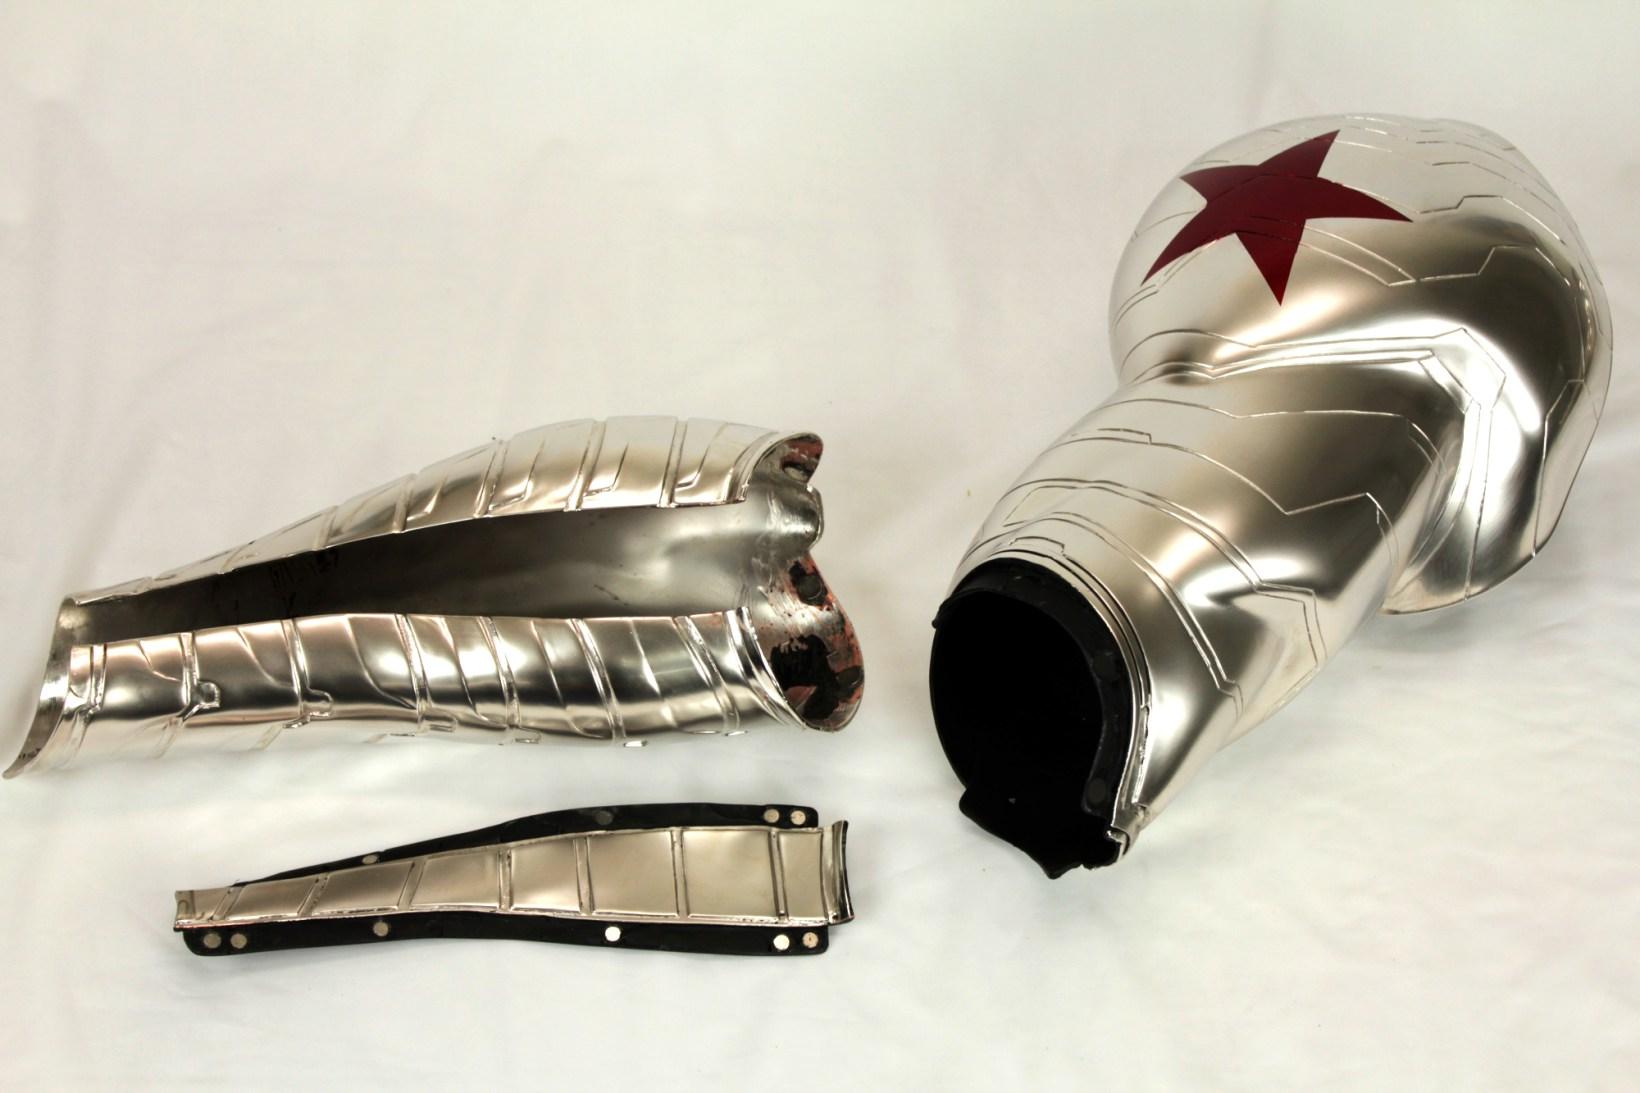 Winter Soldier Arm - SRI (39)